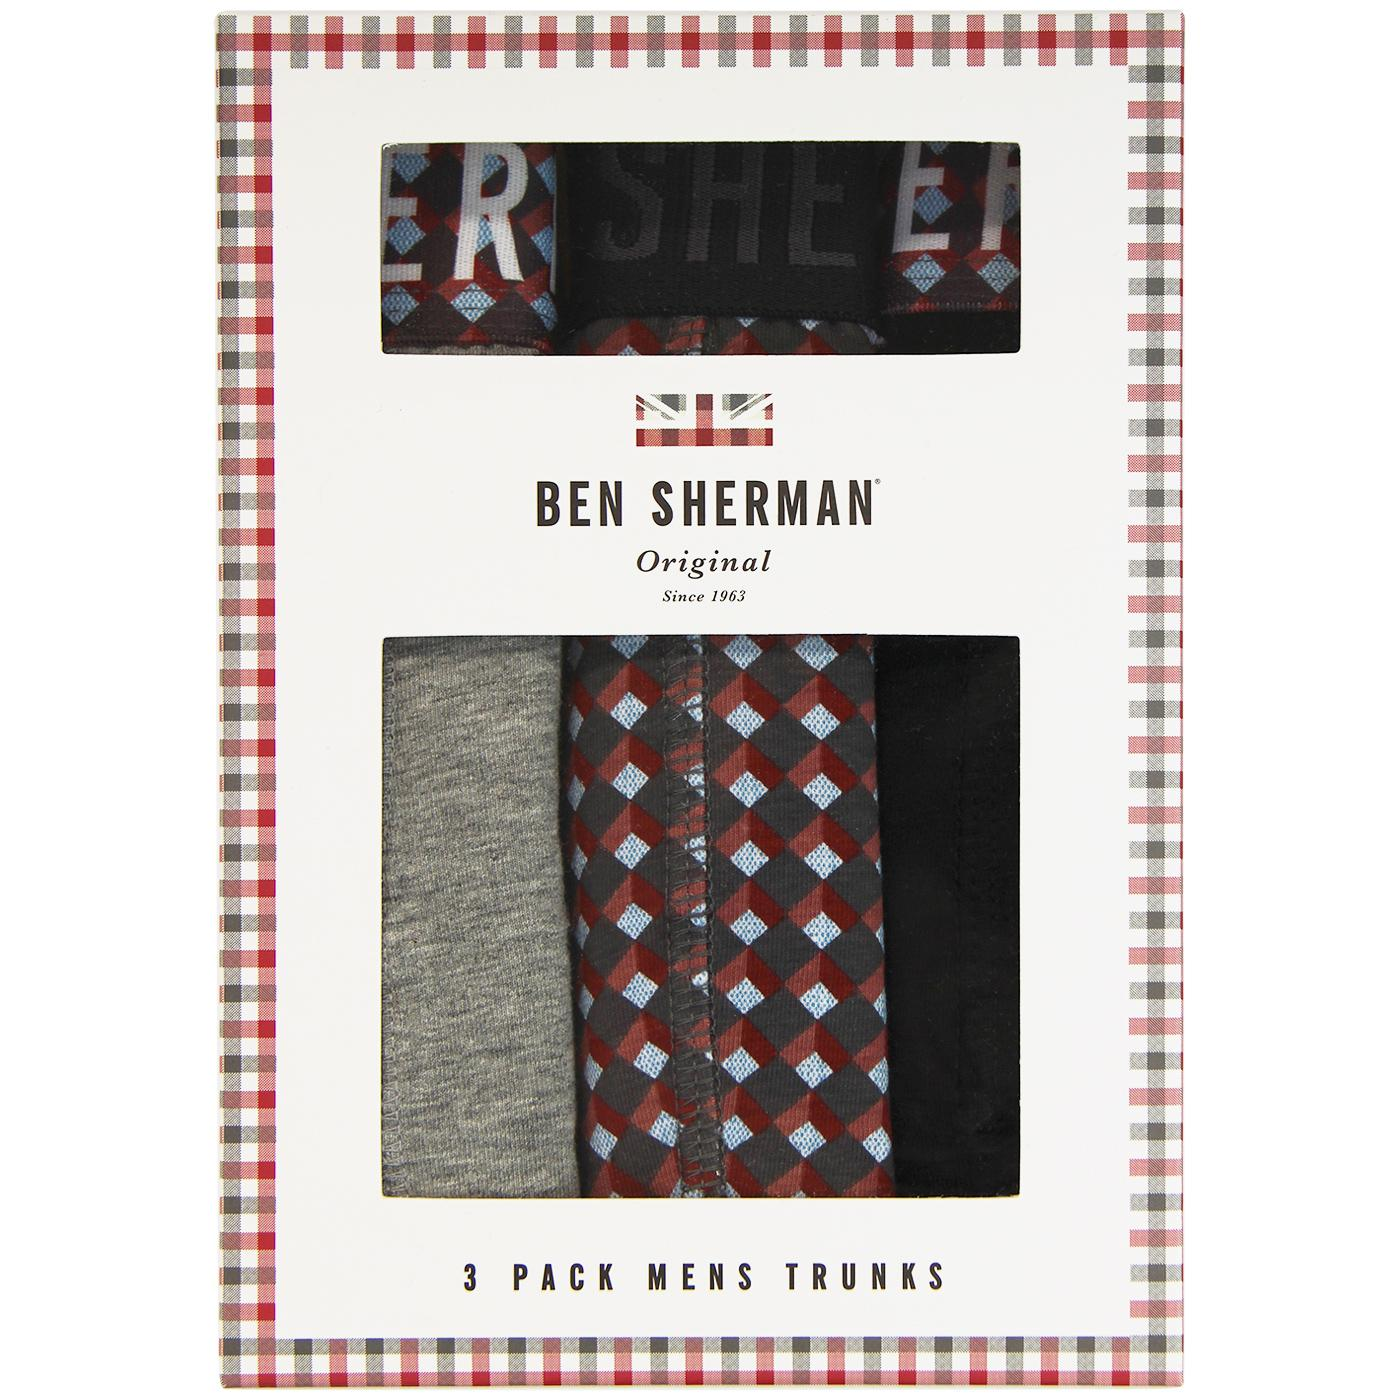 Bertie BEN SHERMAN 3 Pack Retro Trunks Grey/Print